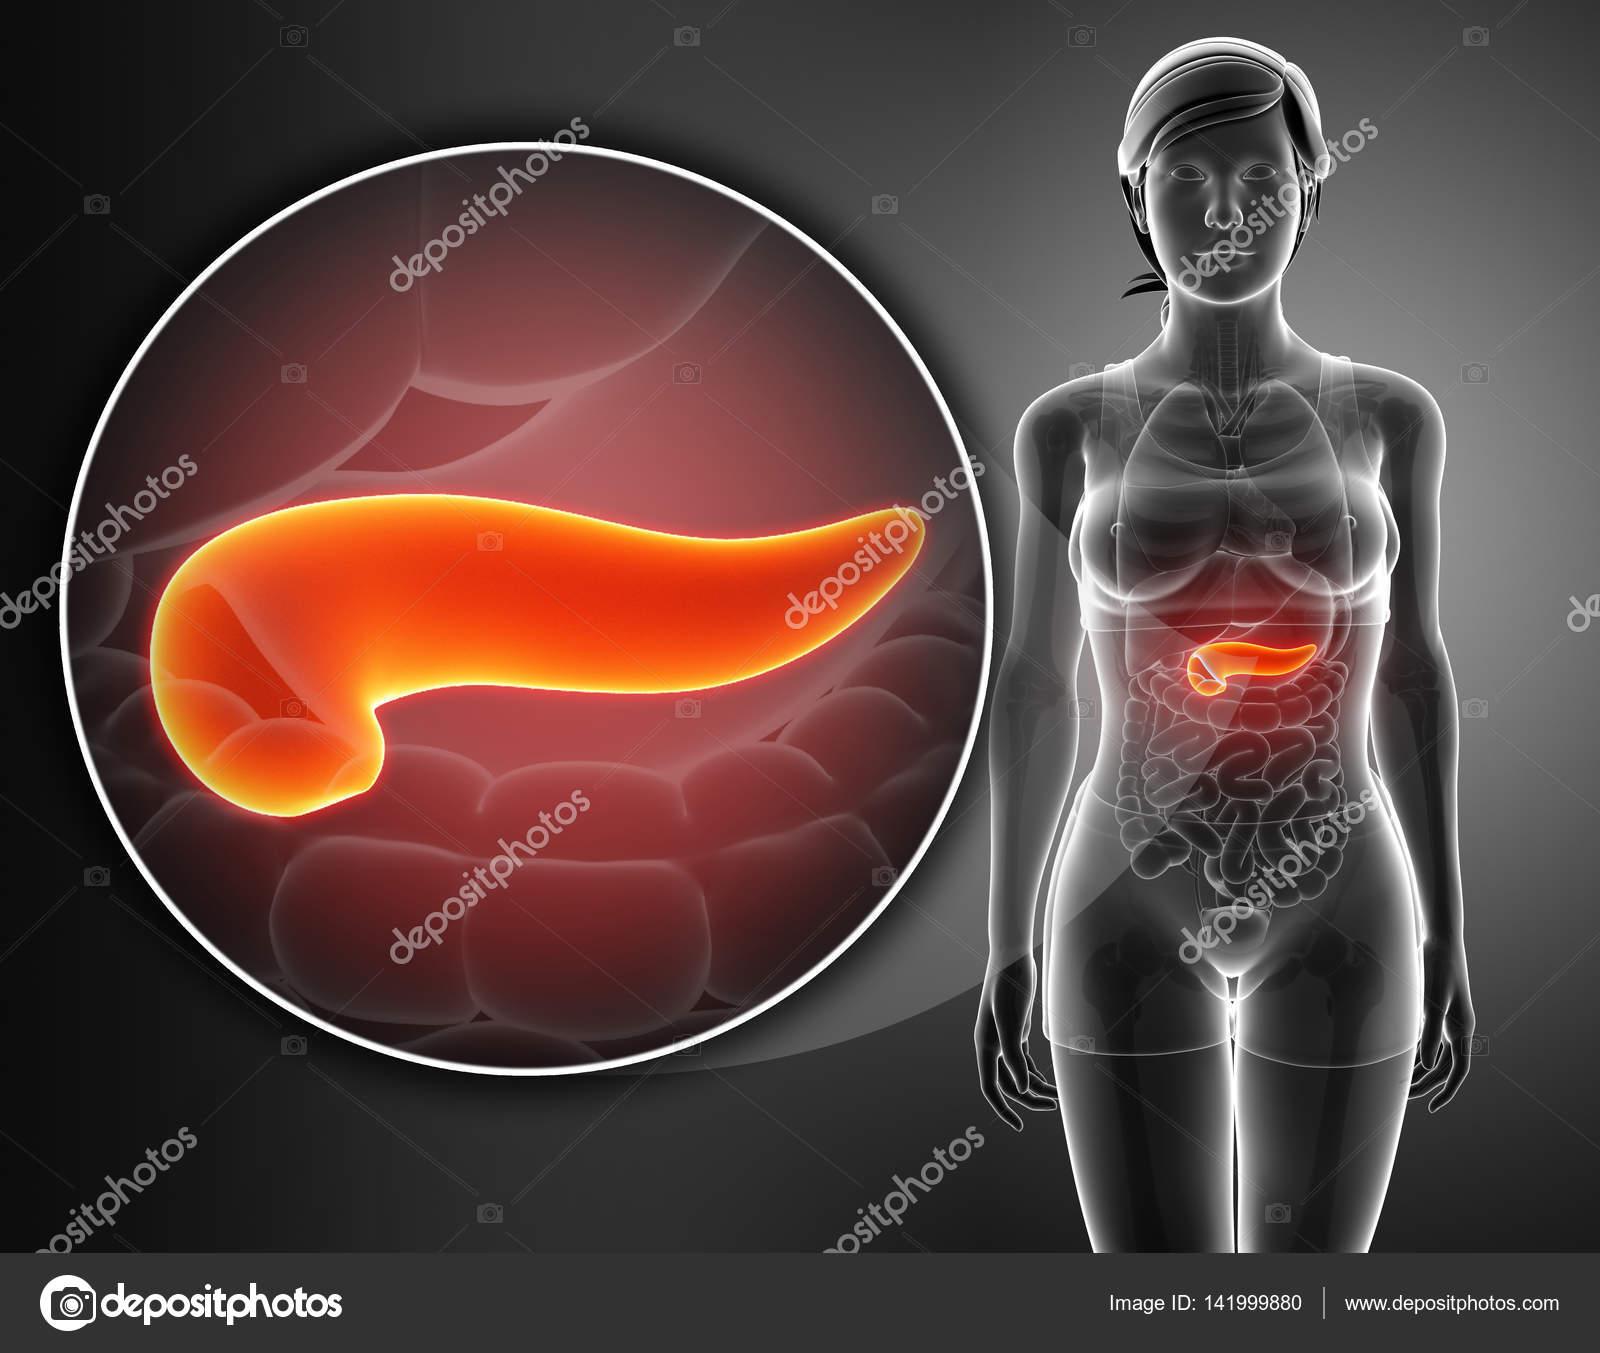 3d render of pancreas anatomy — Stock Photo © pixdesign123 #141999880